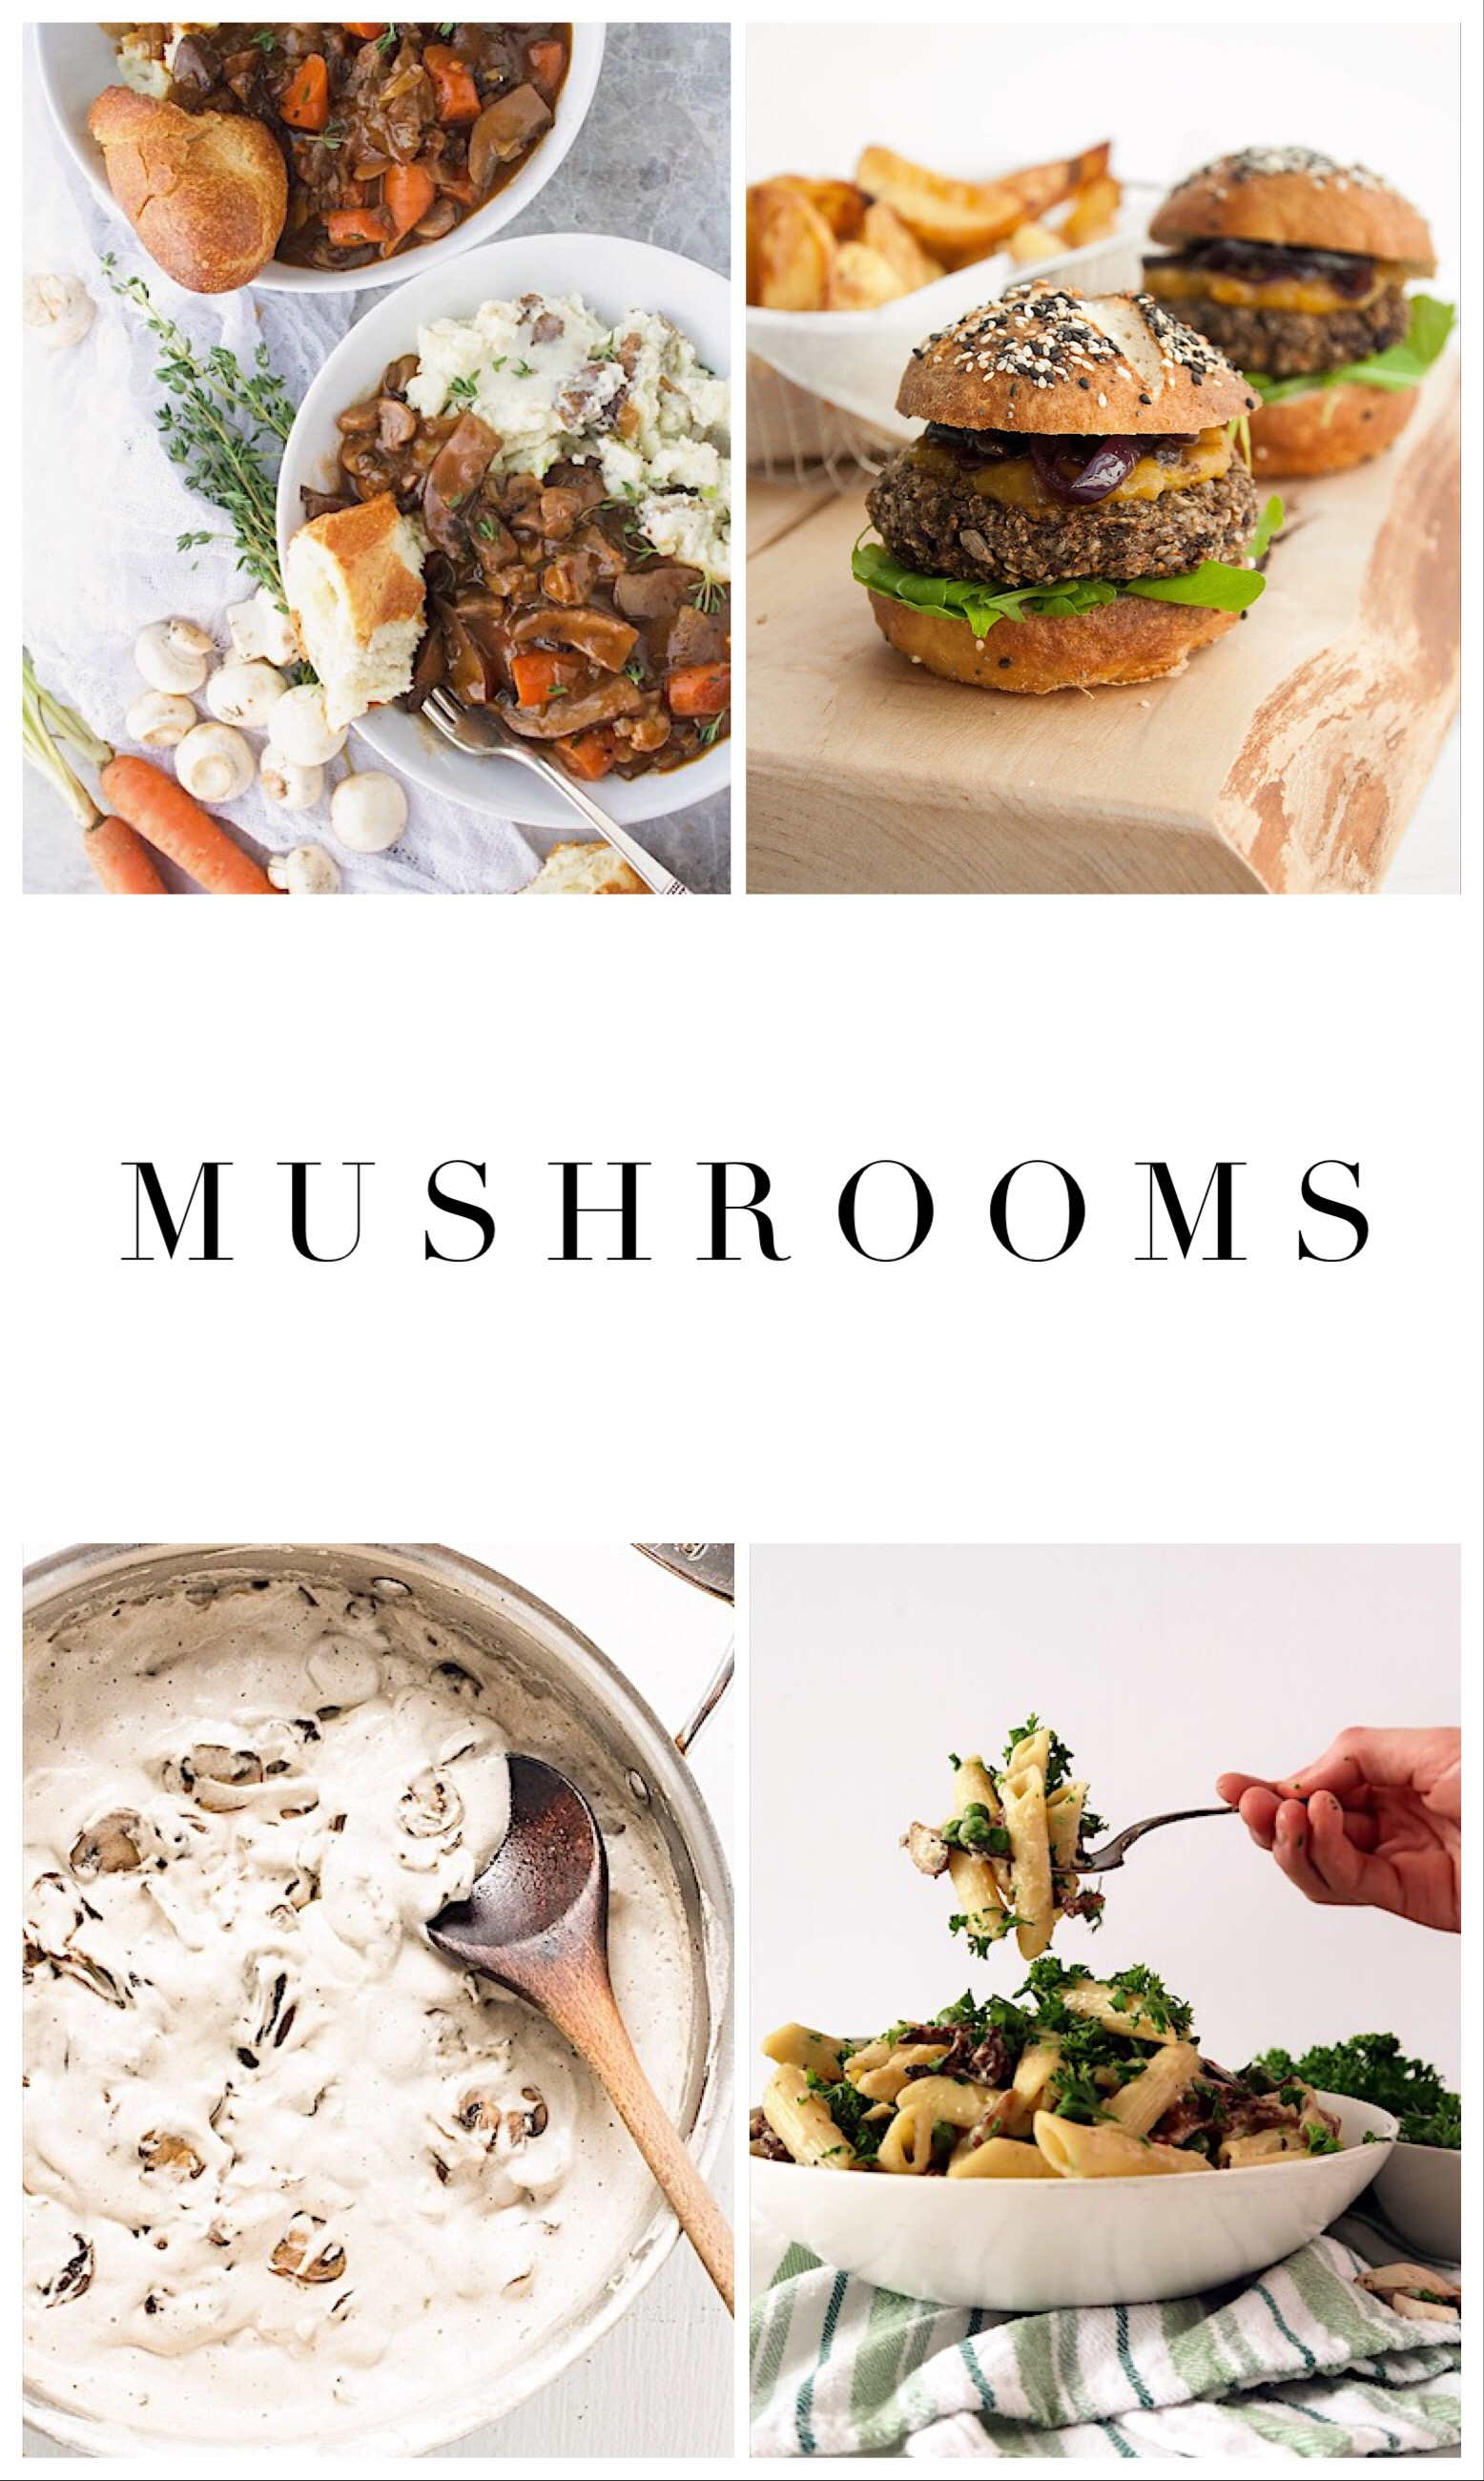 1.    Portobello mushroom bourguignon   , 2.    Mushroom burger   ,  3.    Mushroom sauce   , 4.    Creamy mushroom pasta